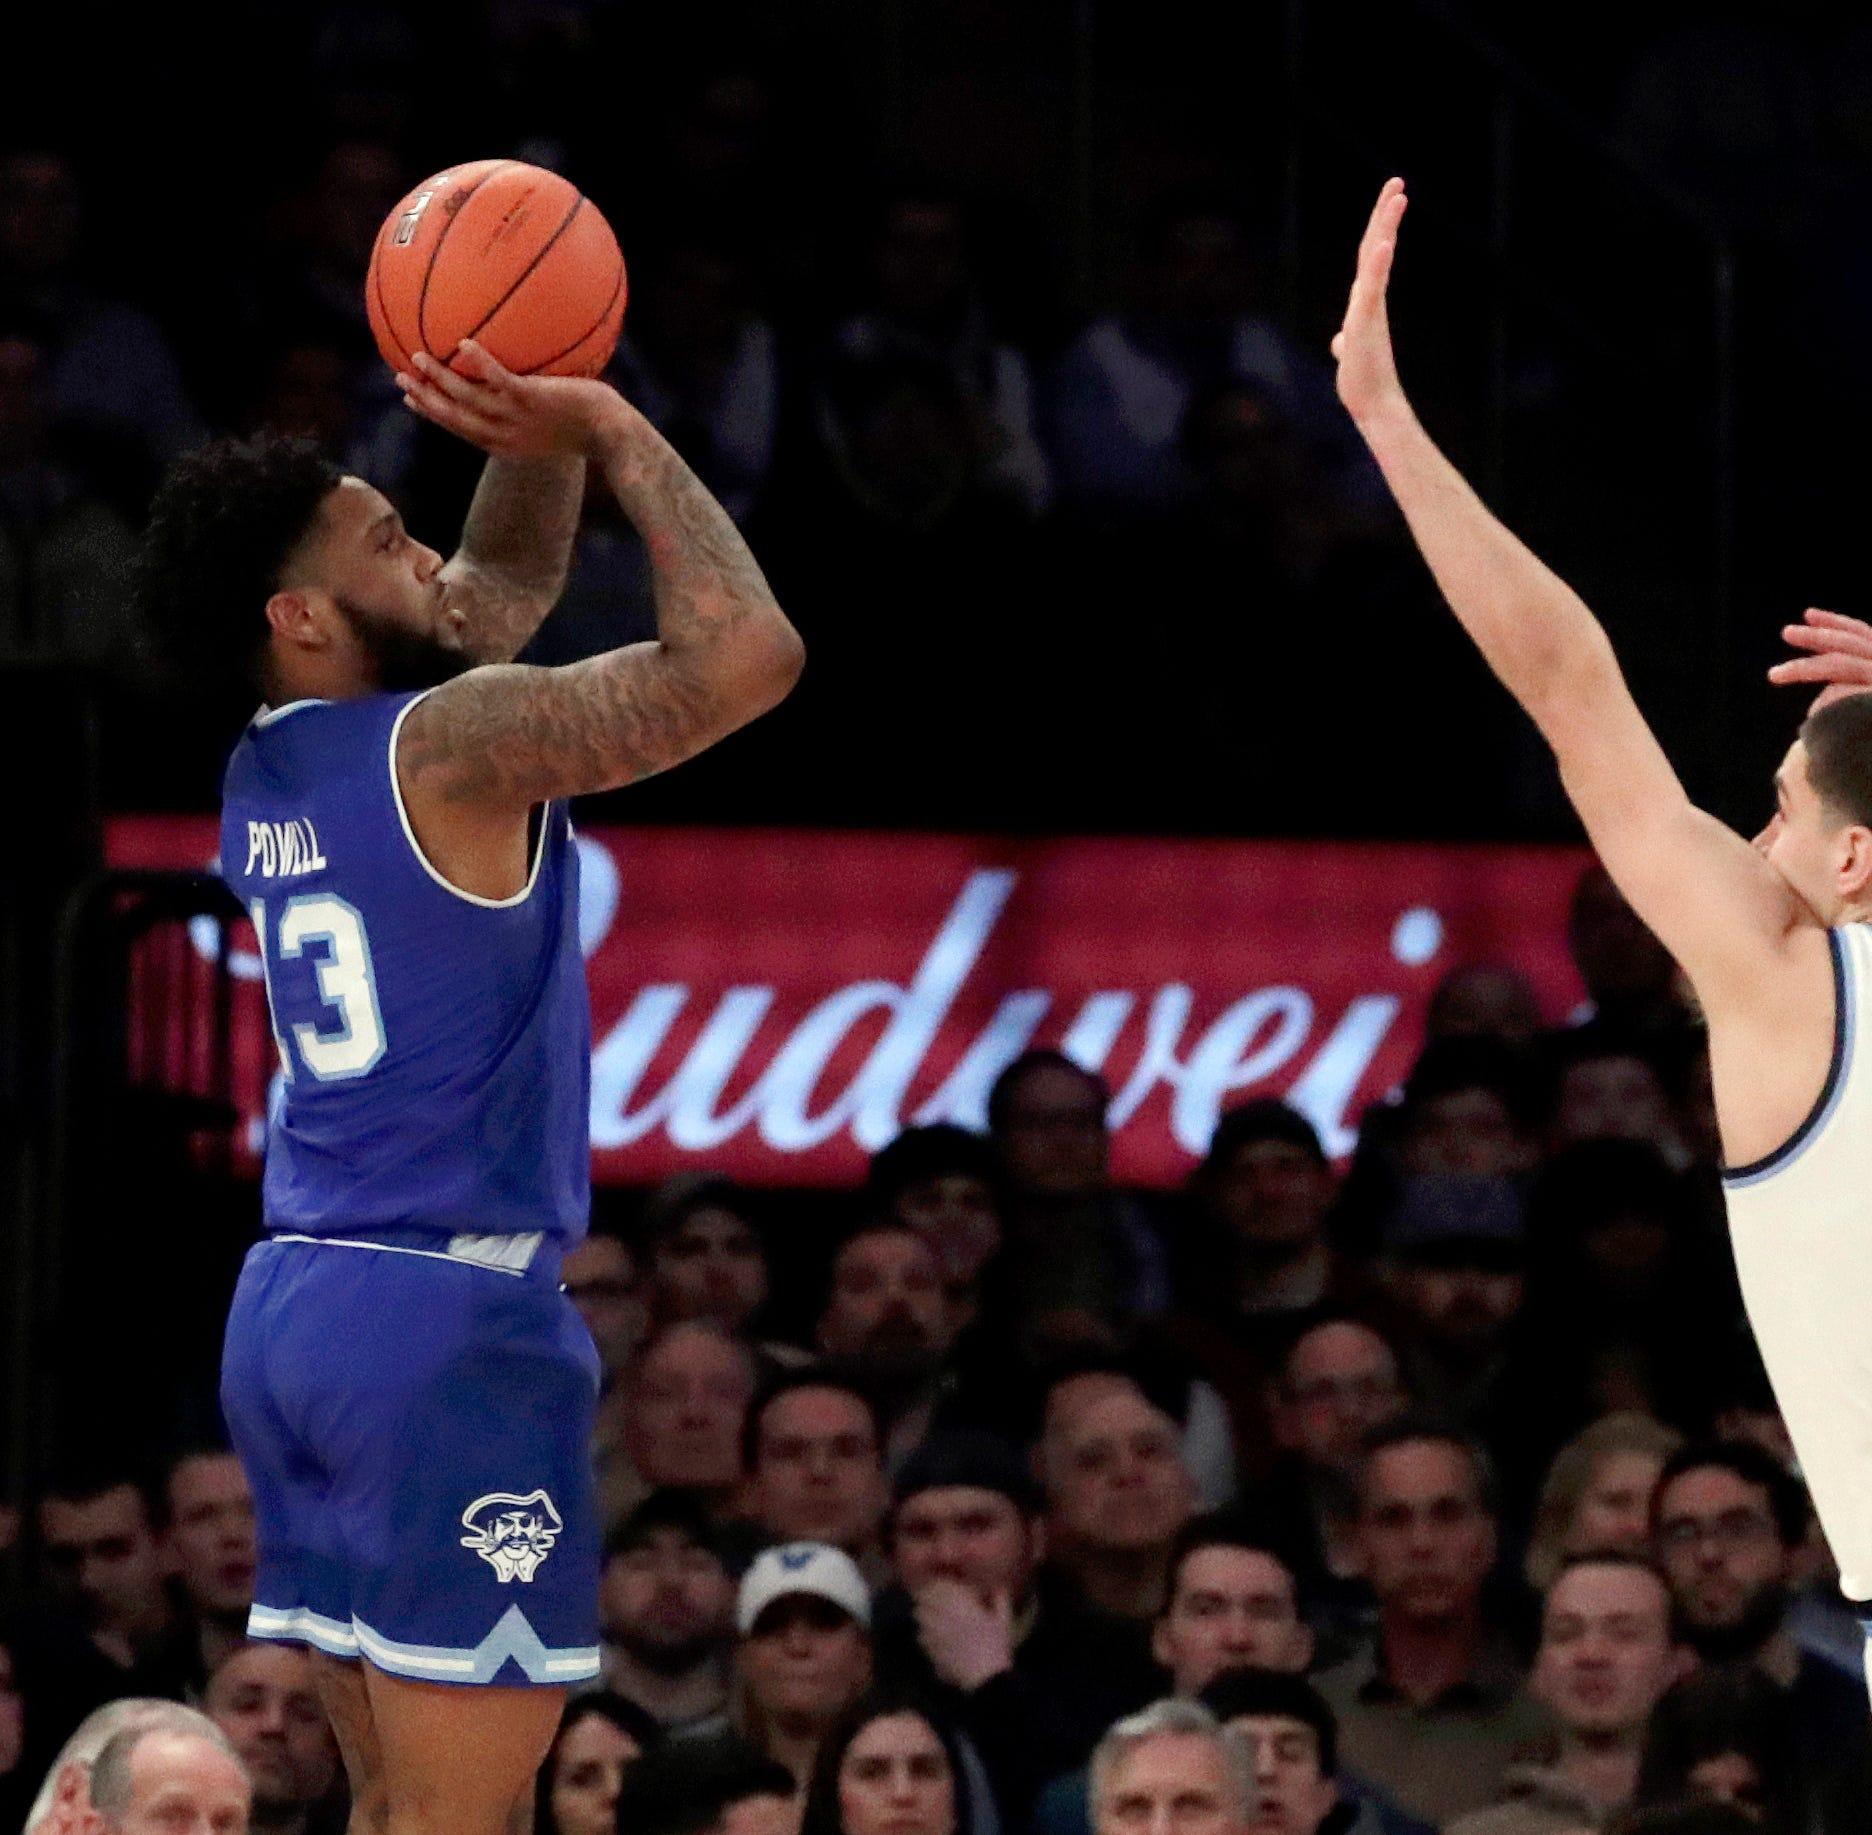 Seton Hall basketball: Rally falls just short to Villanova in Big East Tournament final